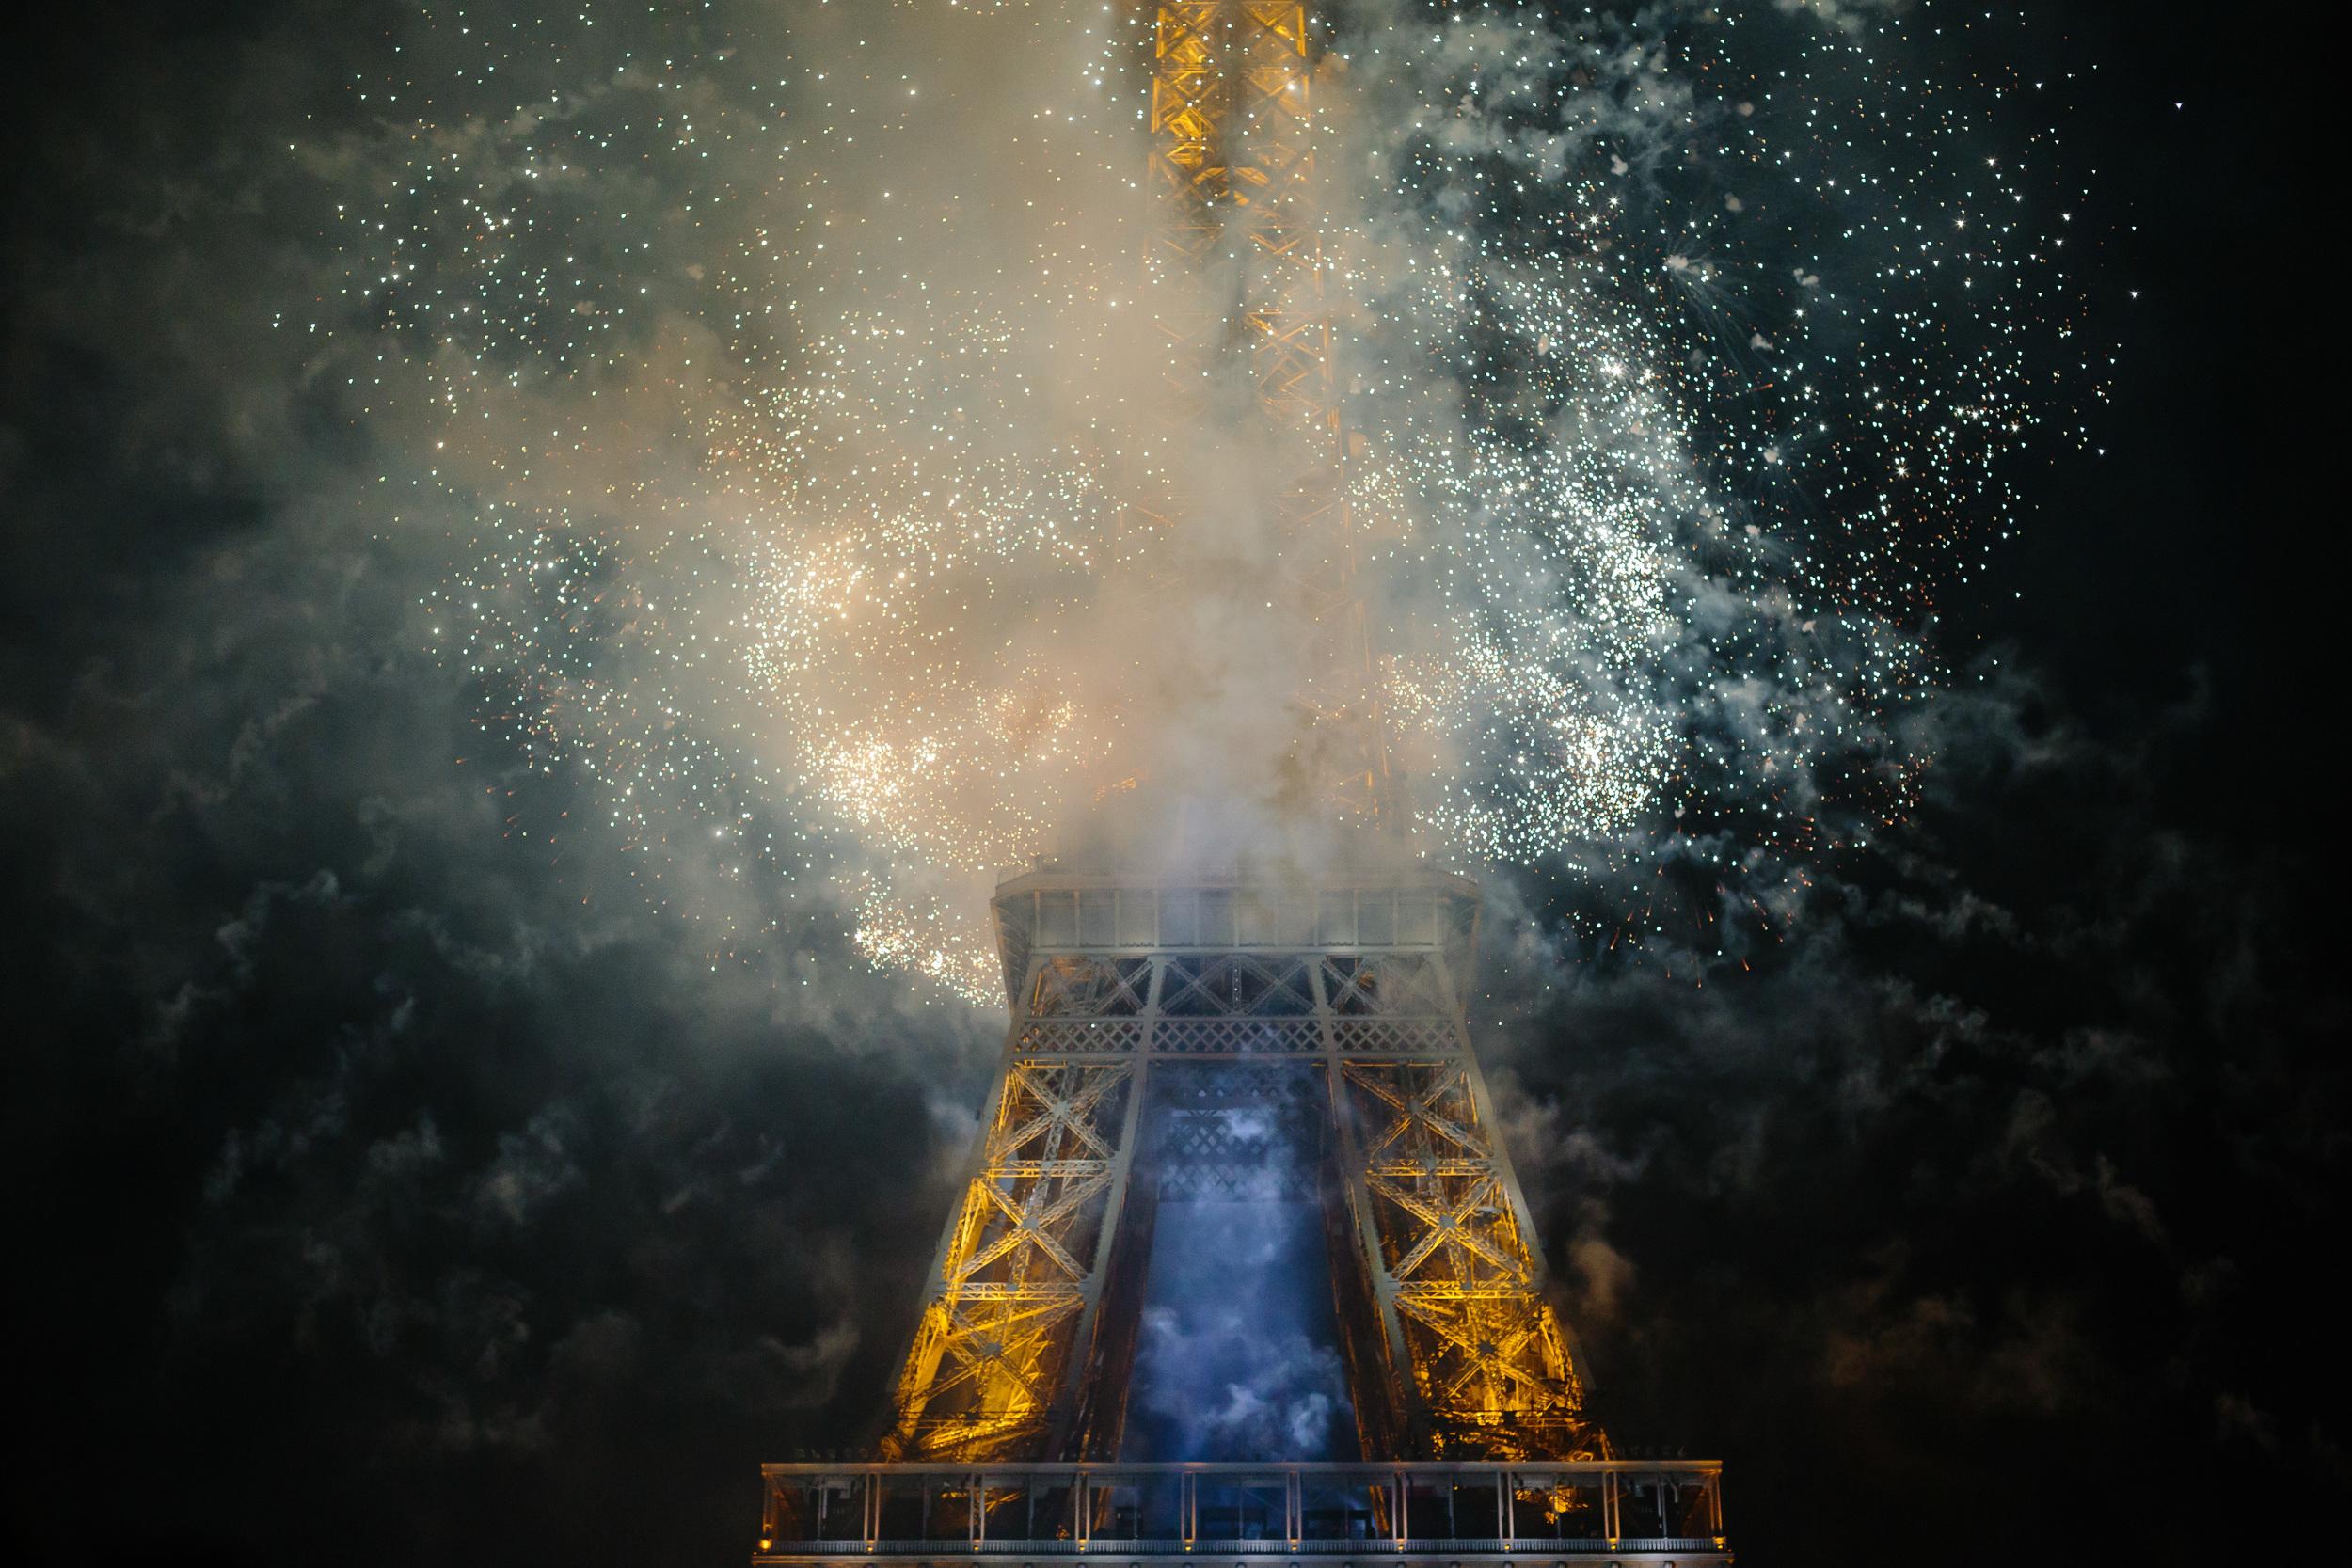 Photographer in Paris, Fireworks, Bastille2015, Eiffel Tower, Iheartparisfr